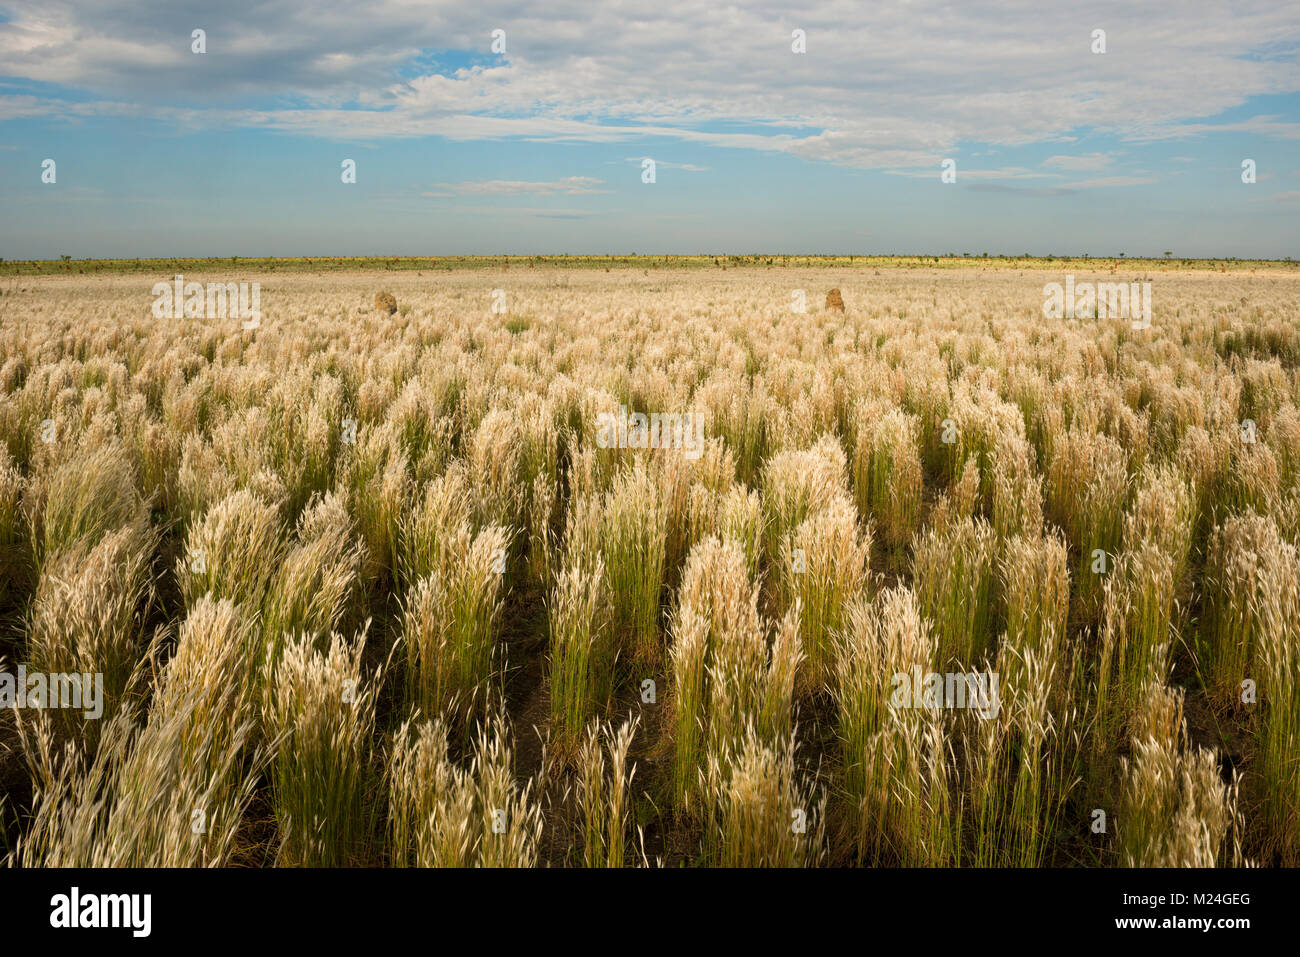 Open grass fields at Emas National Park, GO, Brazil - Stock Image